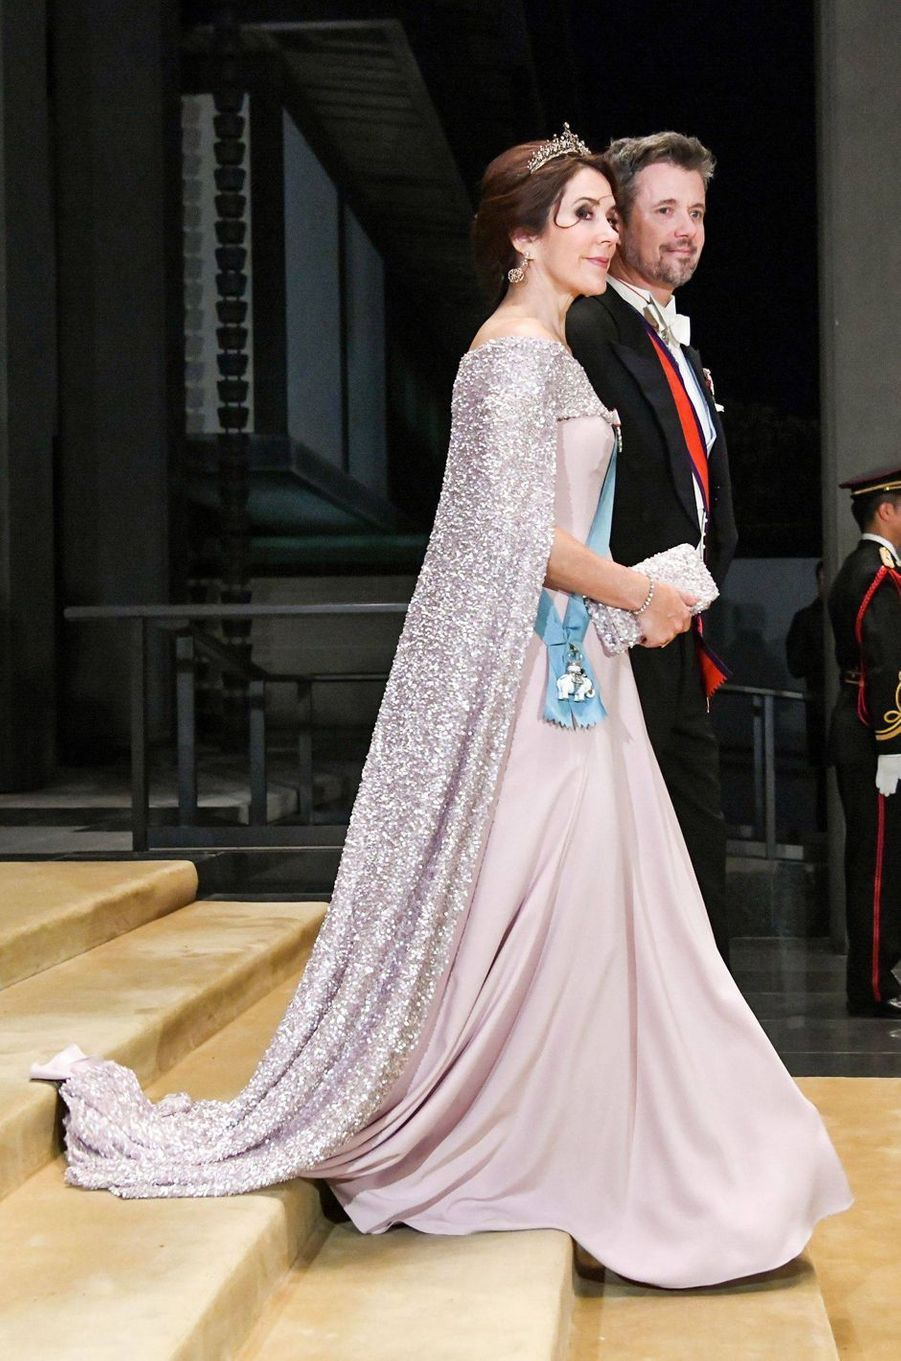 La princesse Mary de Danemark, à Tokyo le 22 octobre 2019